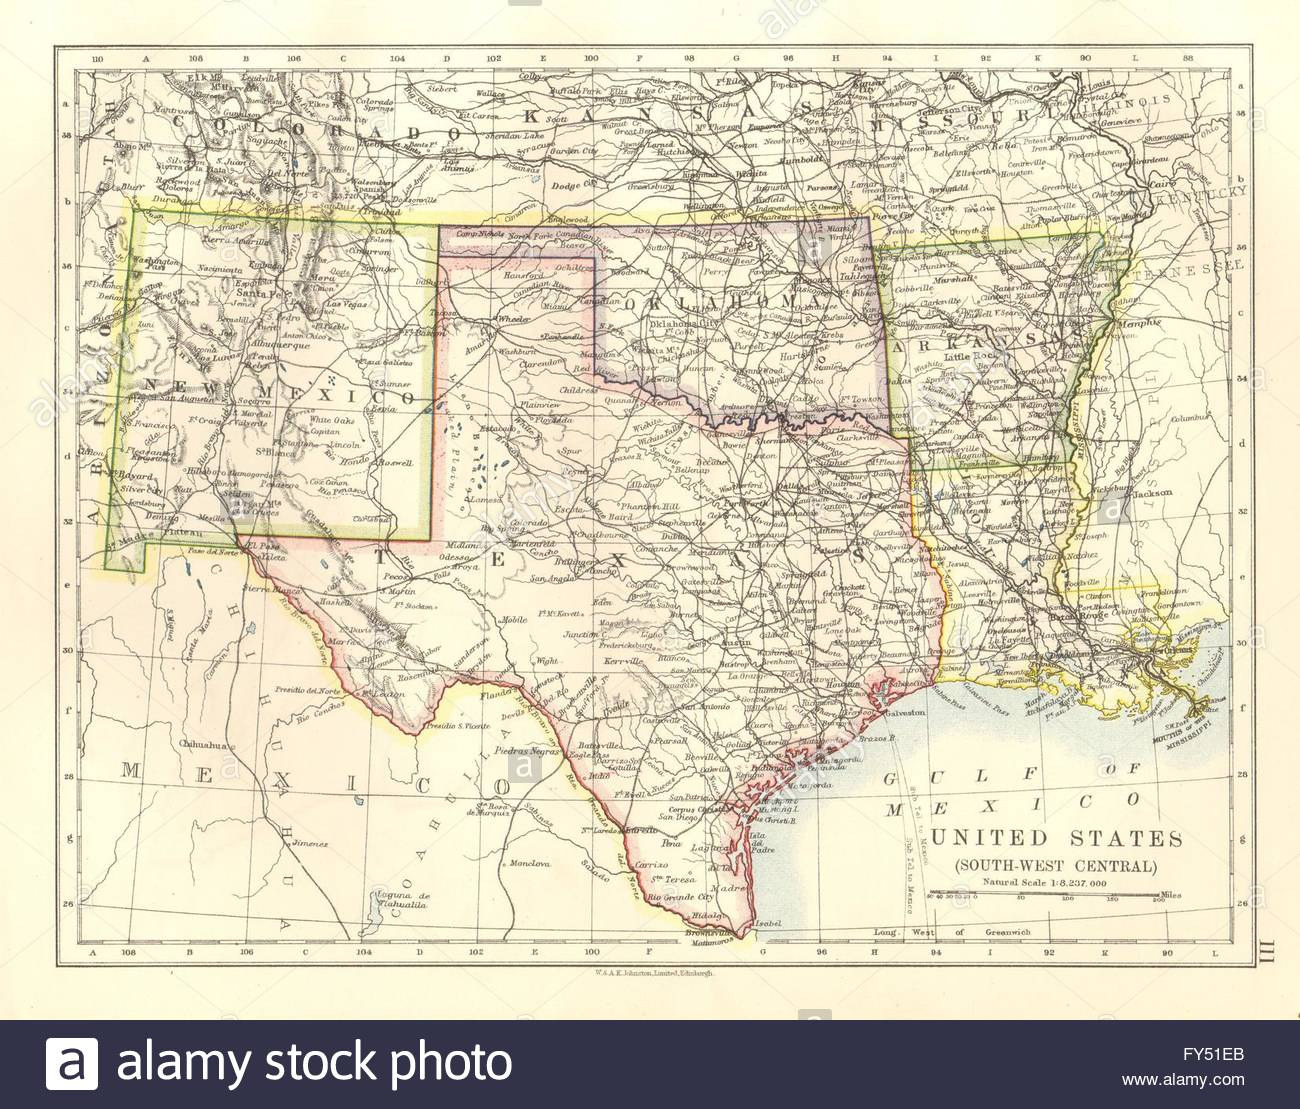 Usa South Central.texas Oklahoma Arkansas New Mexico Louisiana, 1920 - Map Of New Mexico And Texas